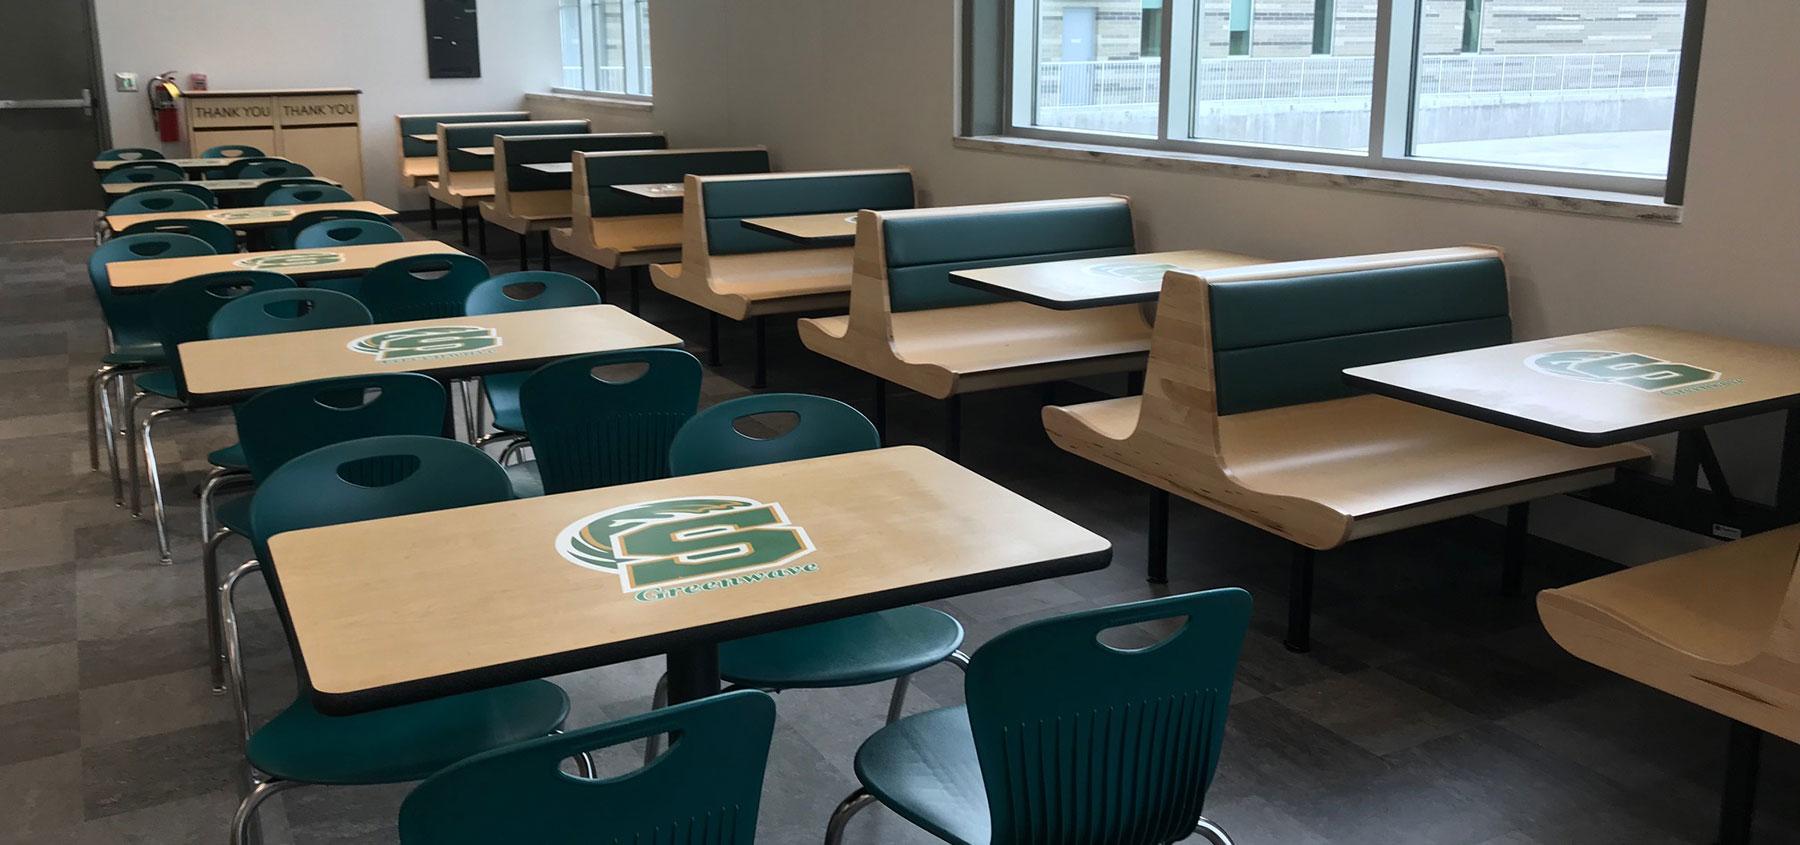 Greenwave Cafeteria